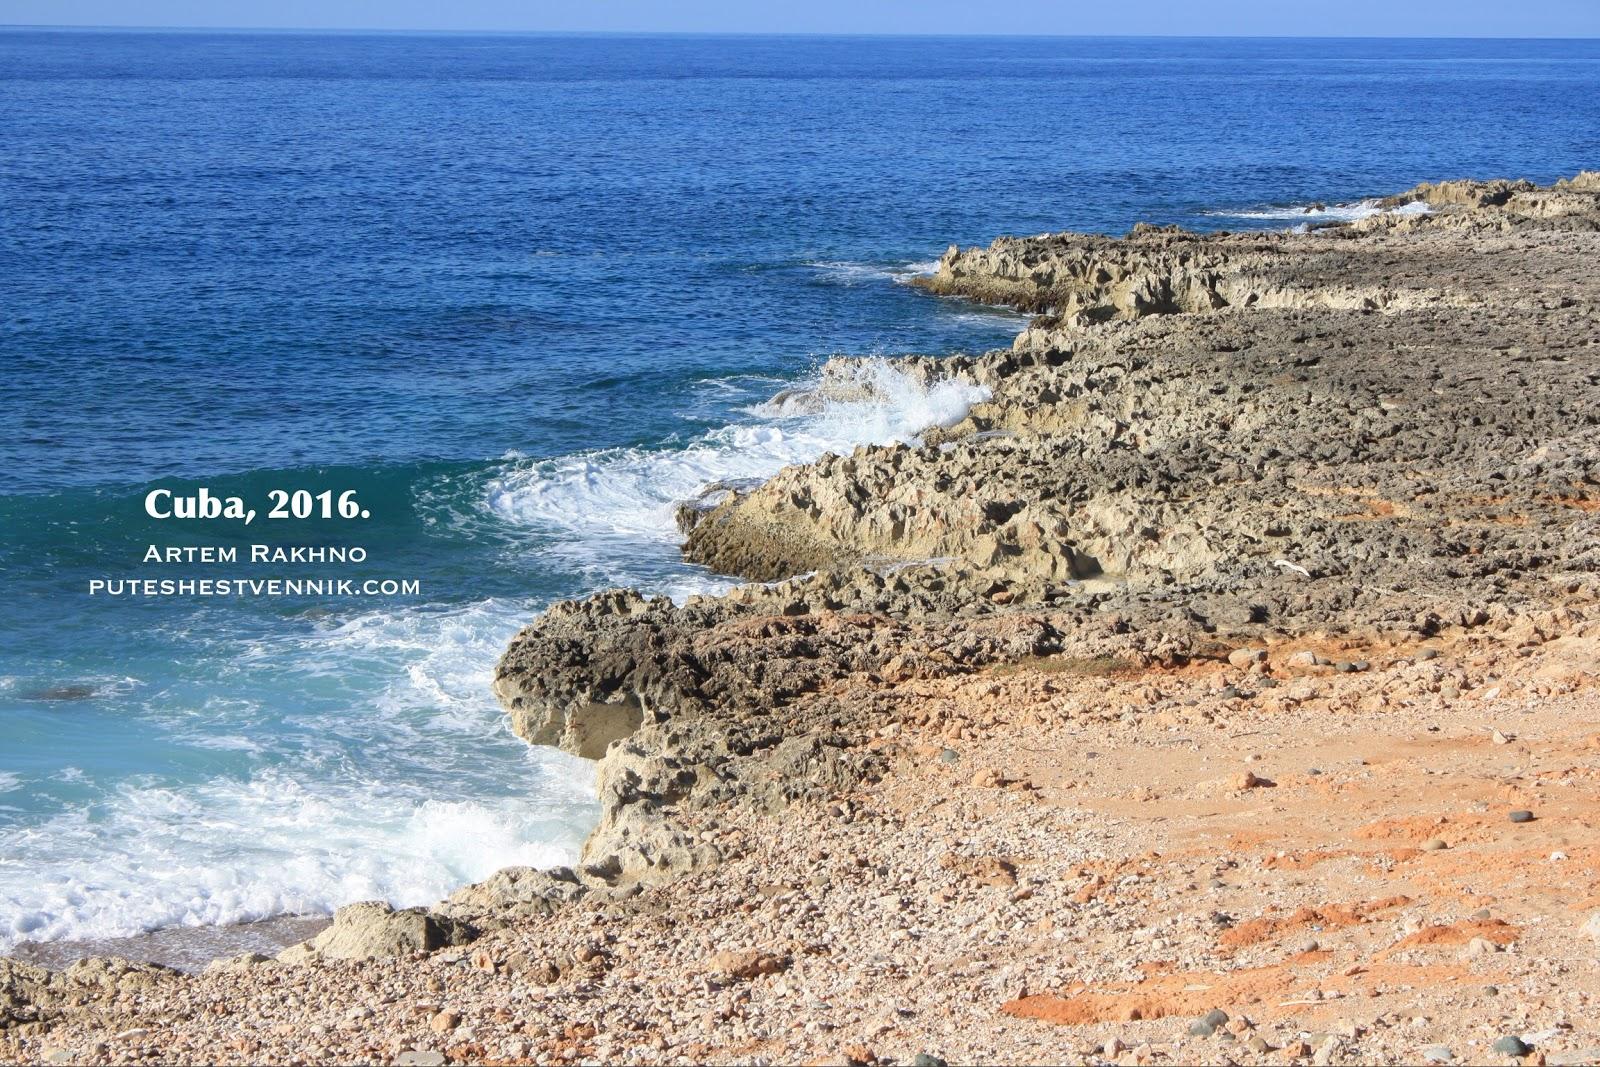 Скалистый берег Карибского моря